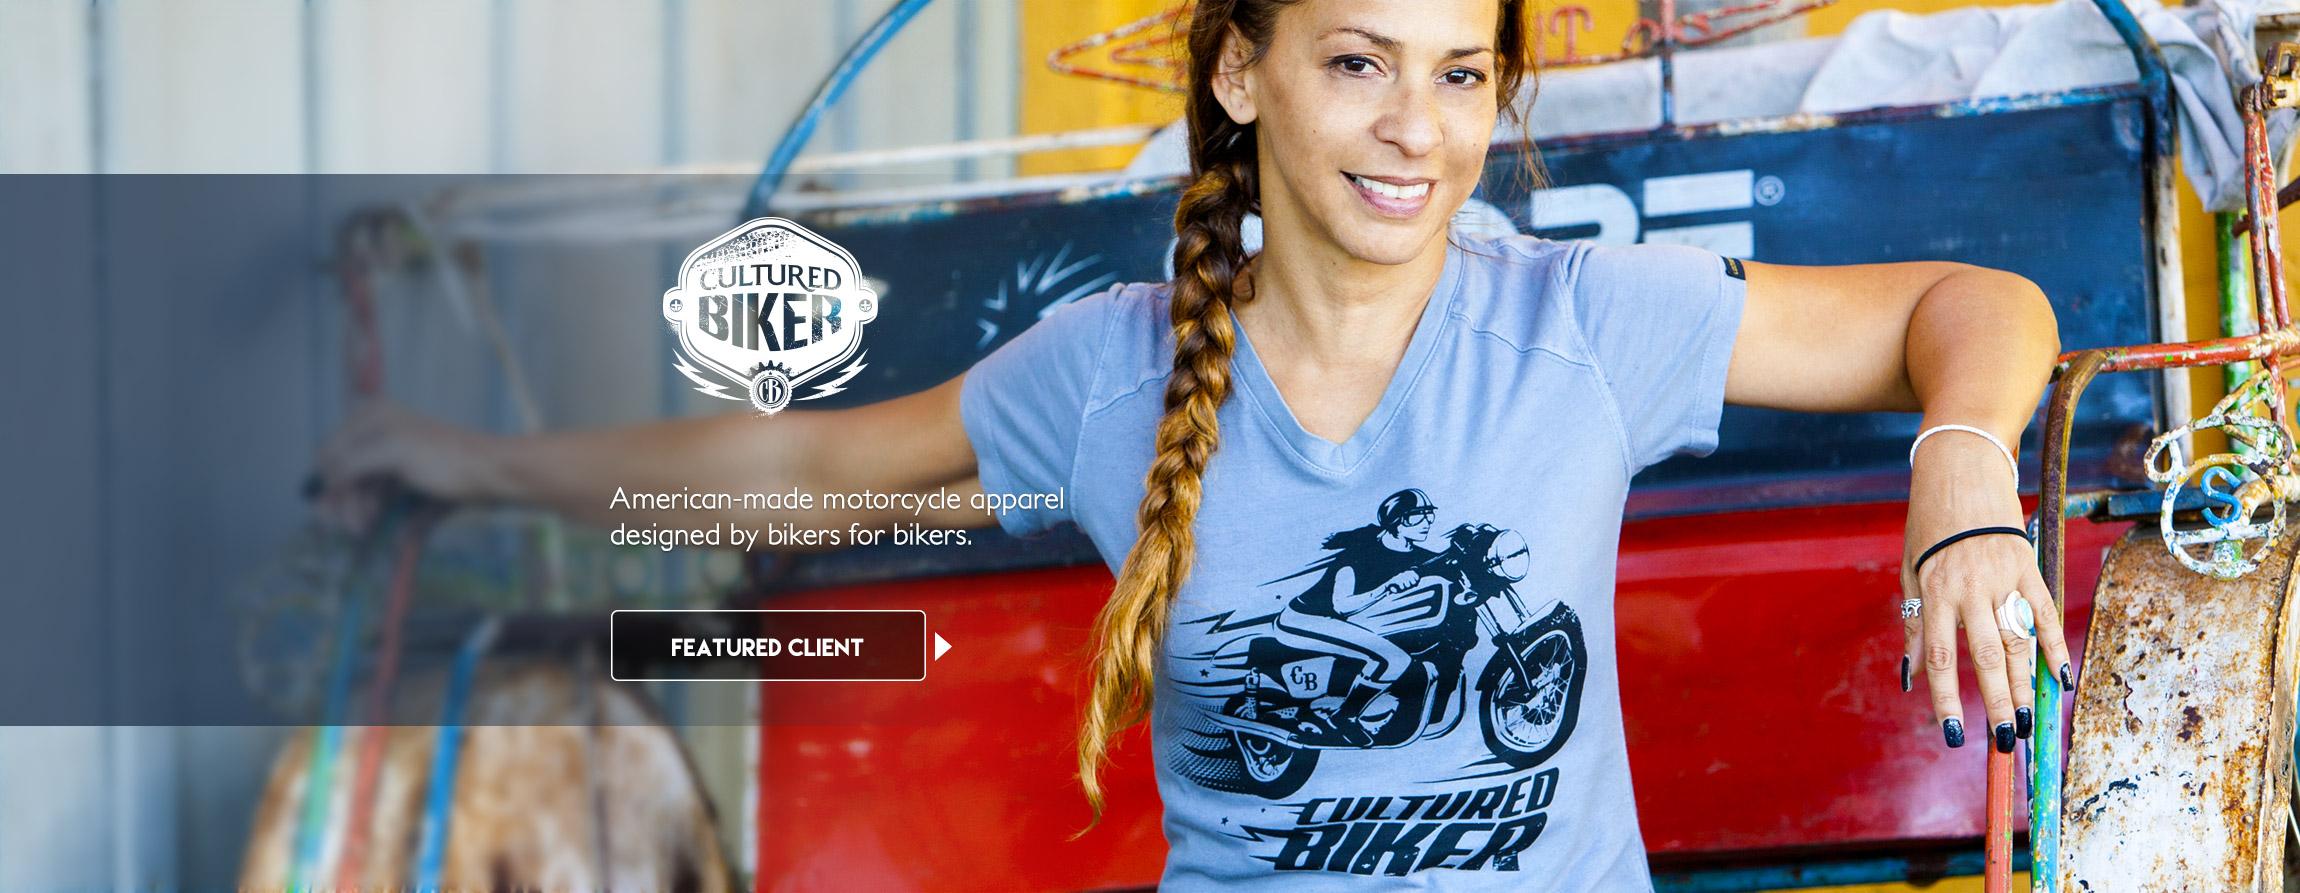 Cultured Biker motorcycle apparel graphic design illustration branding - Graphic Regime Chris Mark